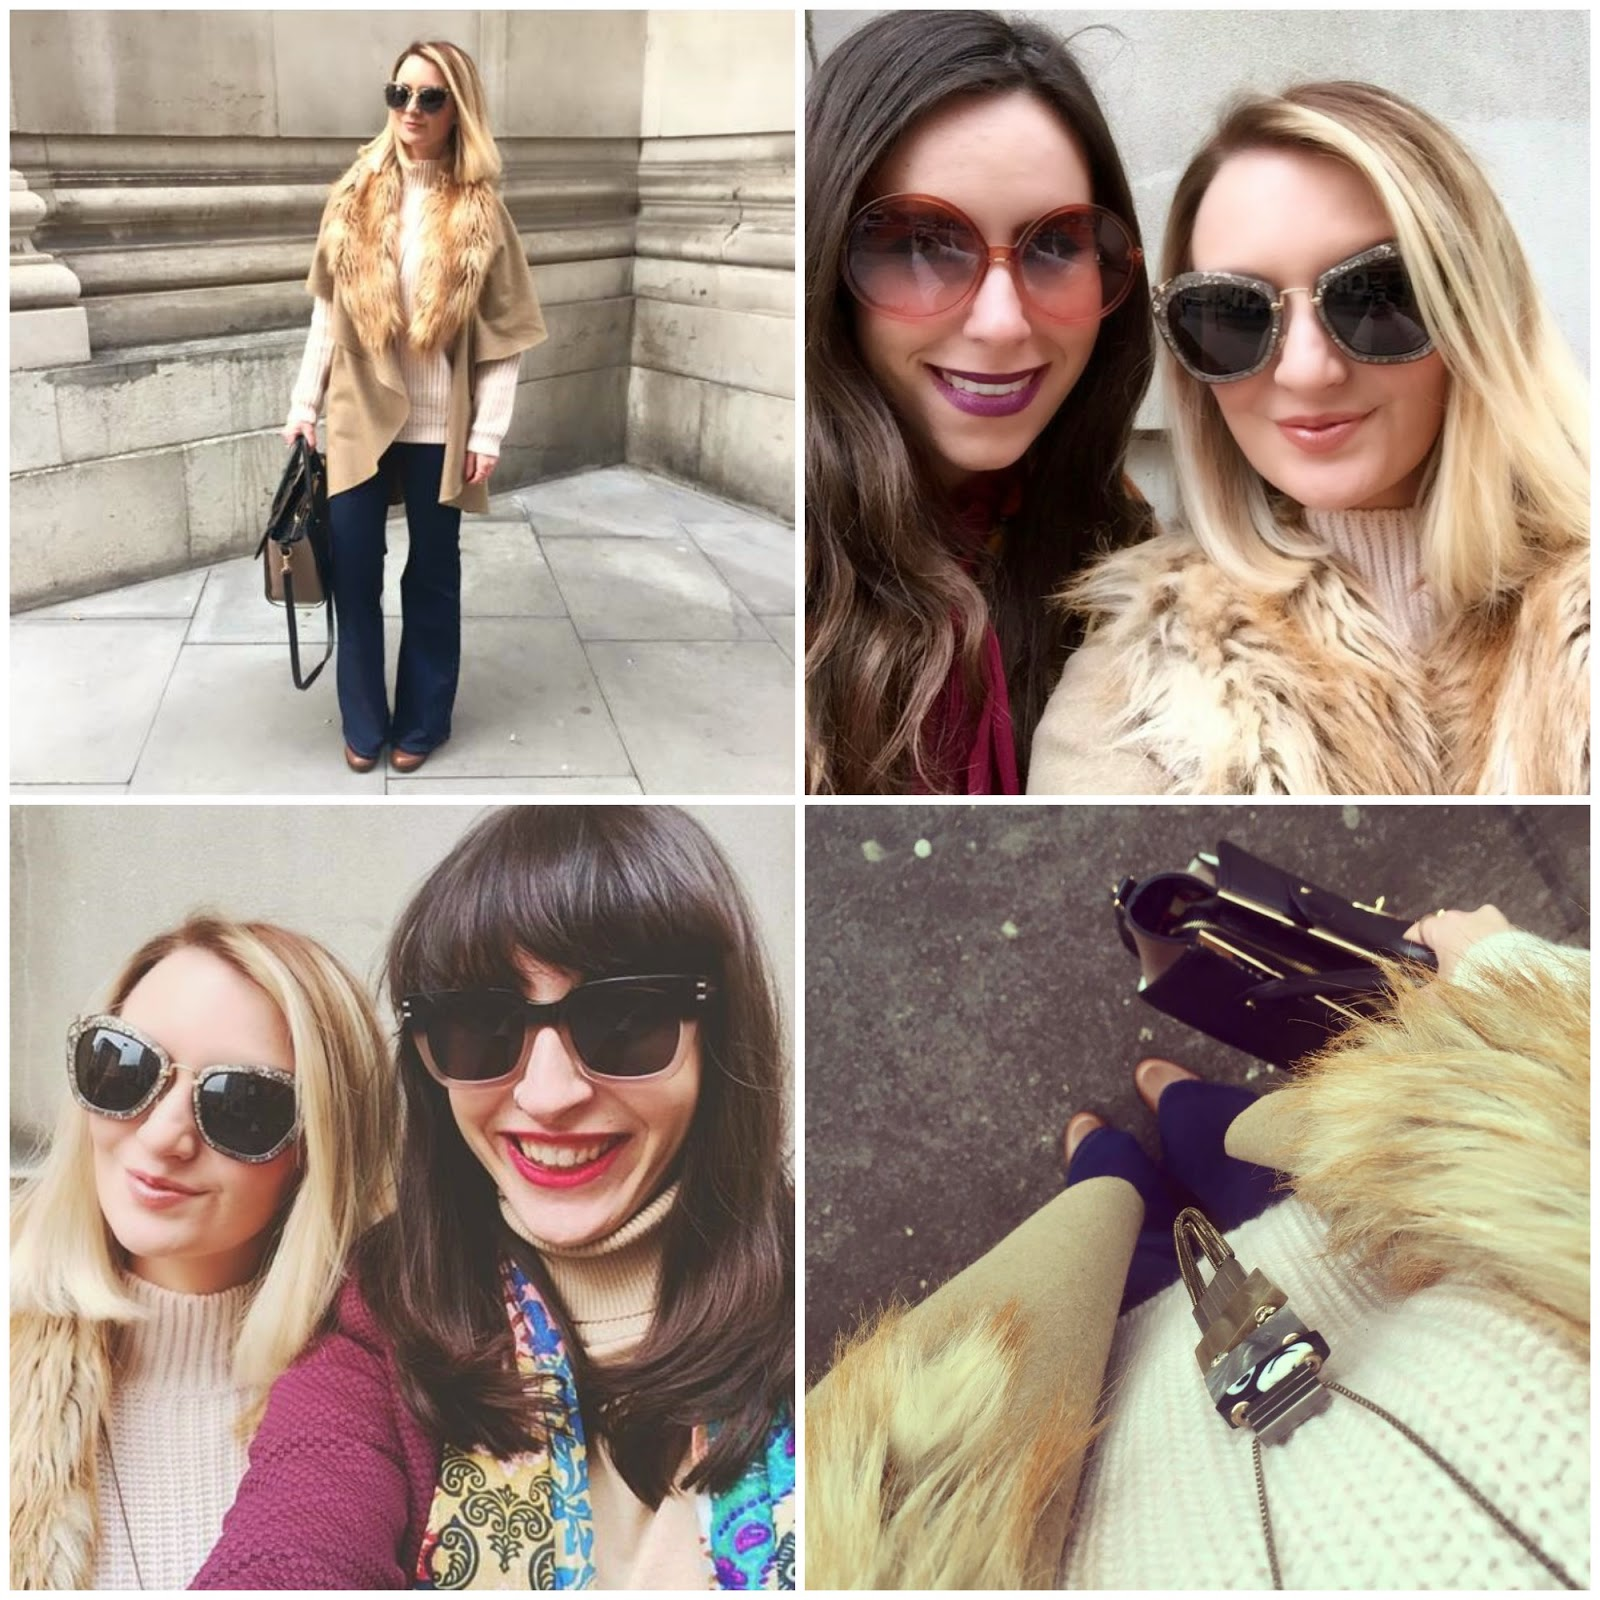 LFW AW15 Snapshots: Photo Diary, mode madeleine, fashion blogger, LFW, AW15, london fashion week, seventies, styling, catwalk, fashion week, felder felder, bora aksu, red hot sunglasses, sam faires, michelle keegan, rosie londoner